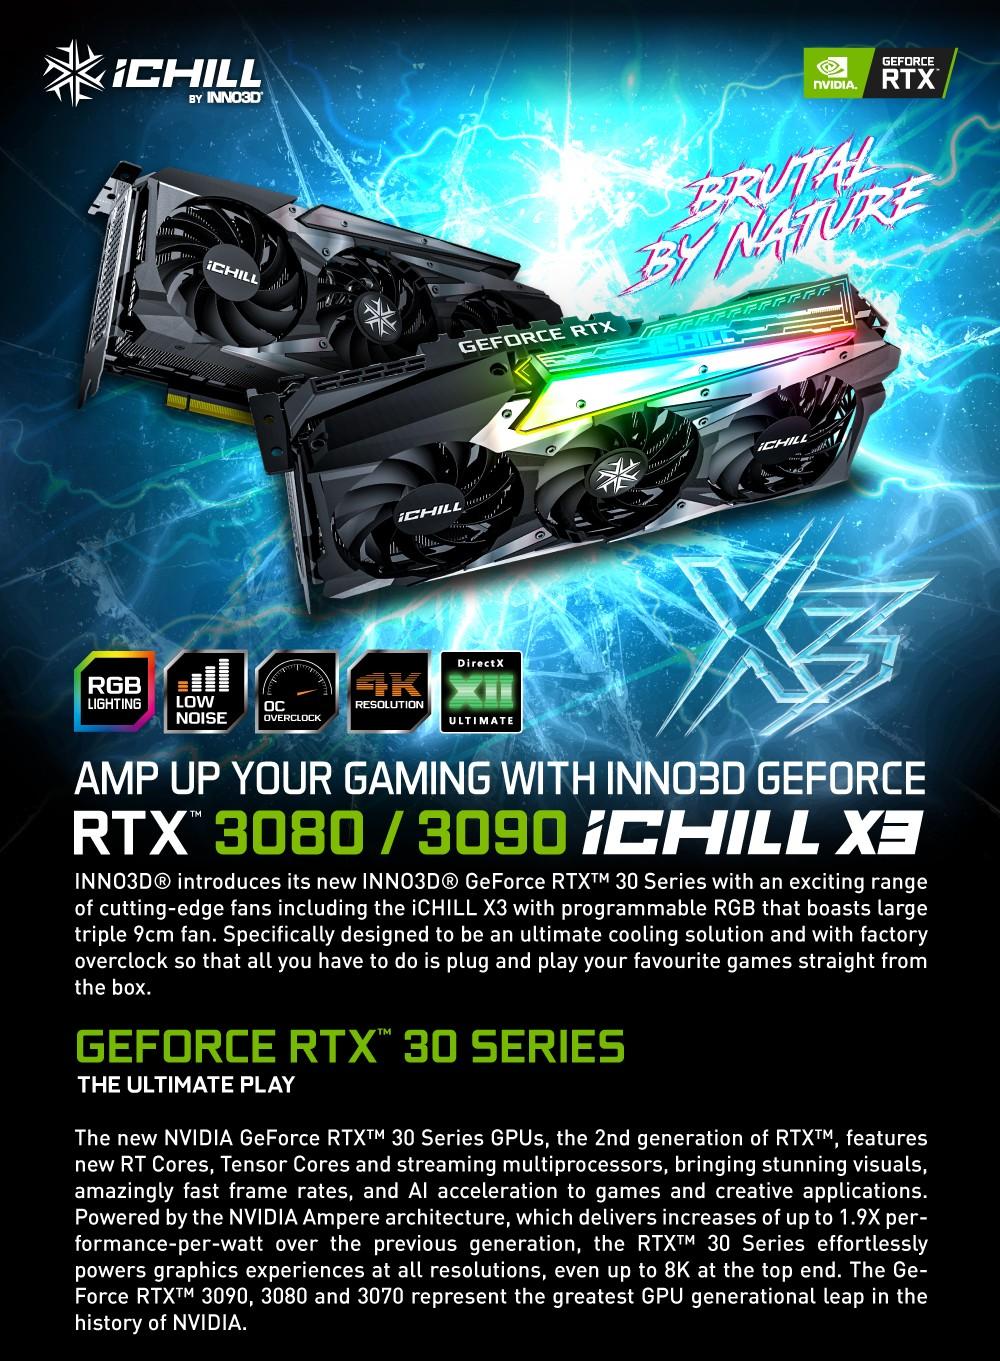 INNO3D RTX 3080 ICHILL X3